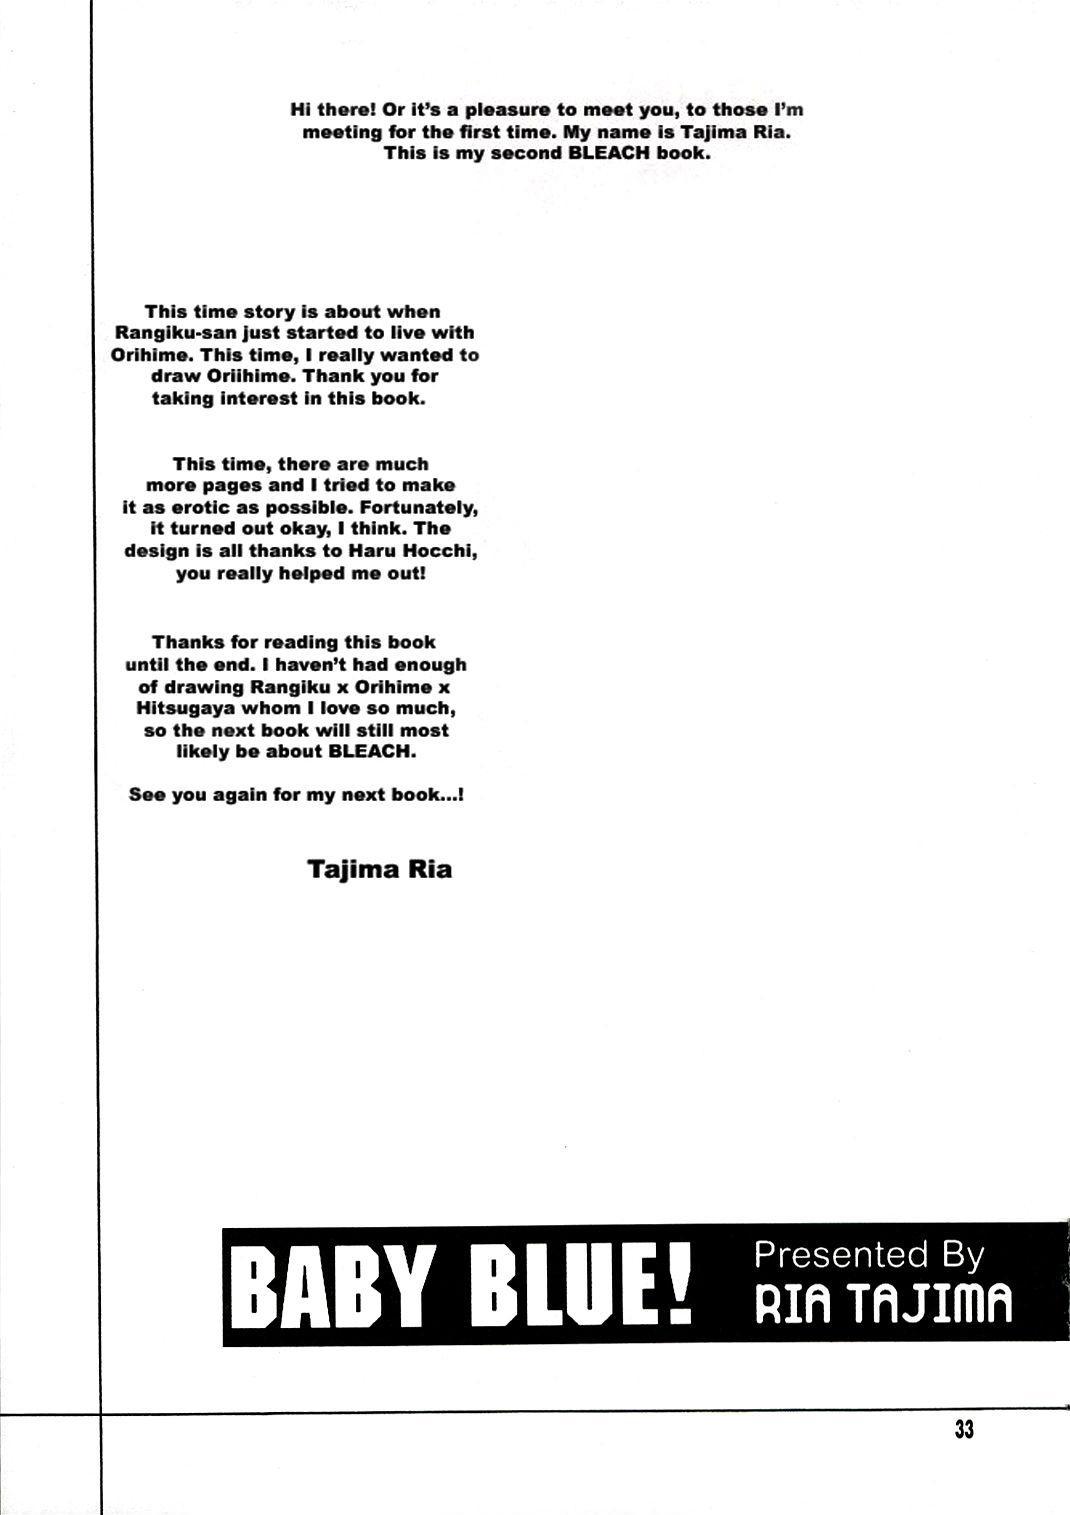 BABY BLUE! 31